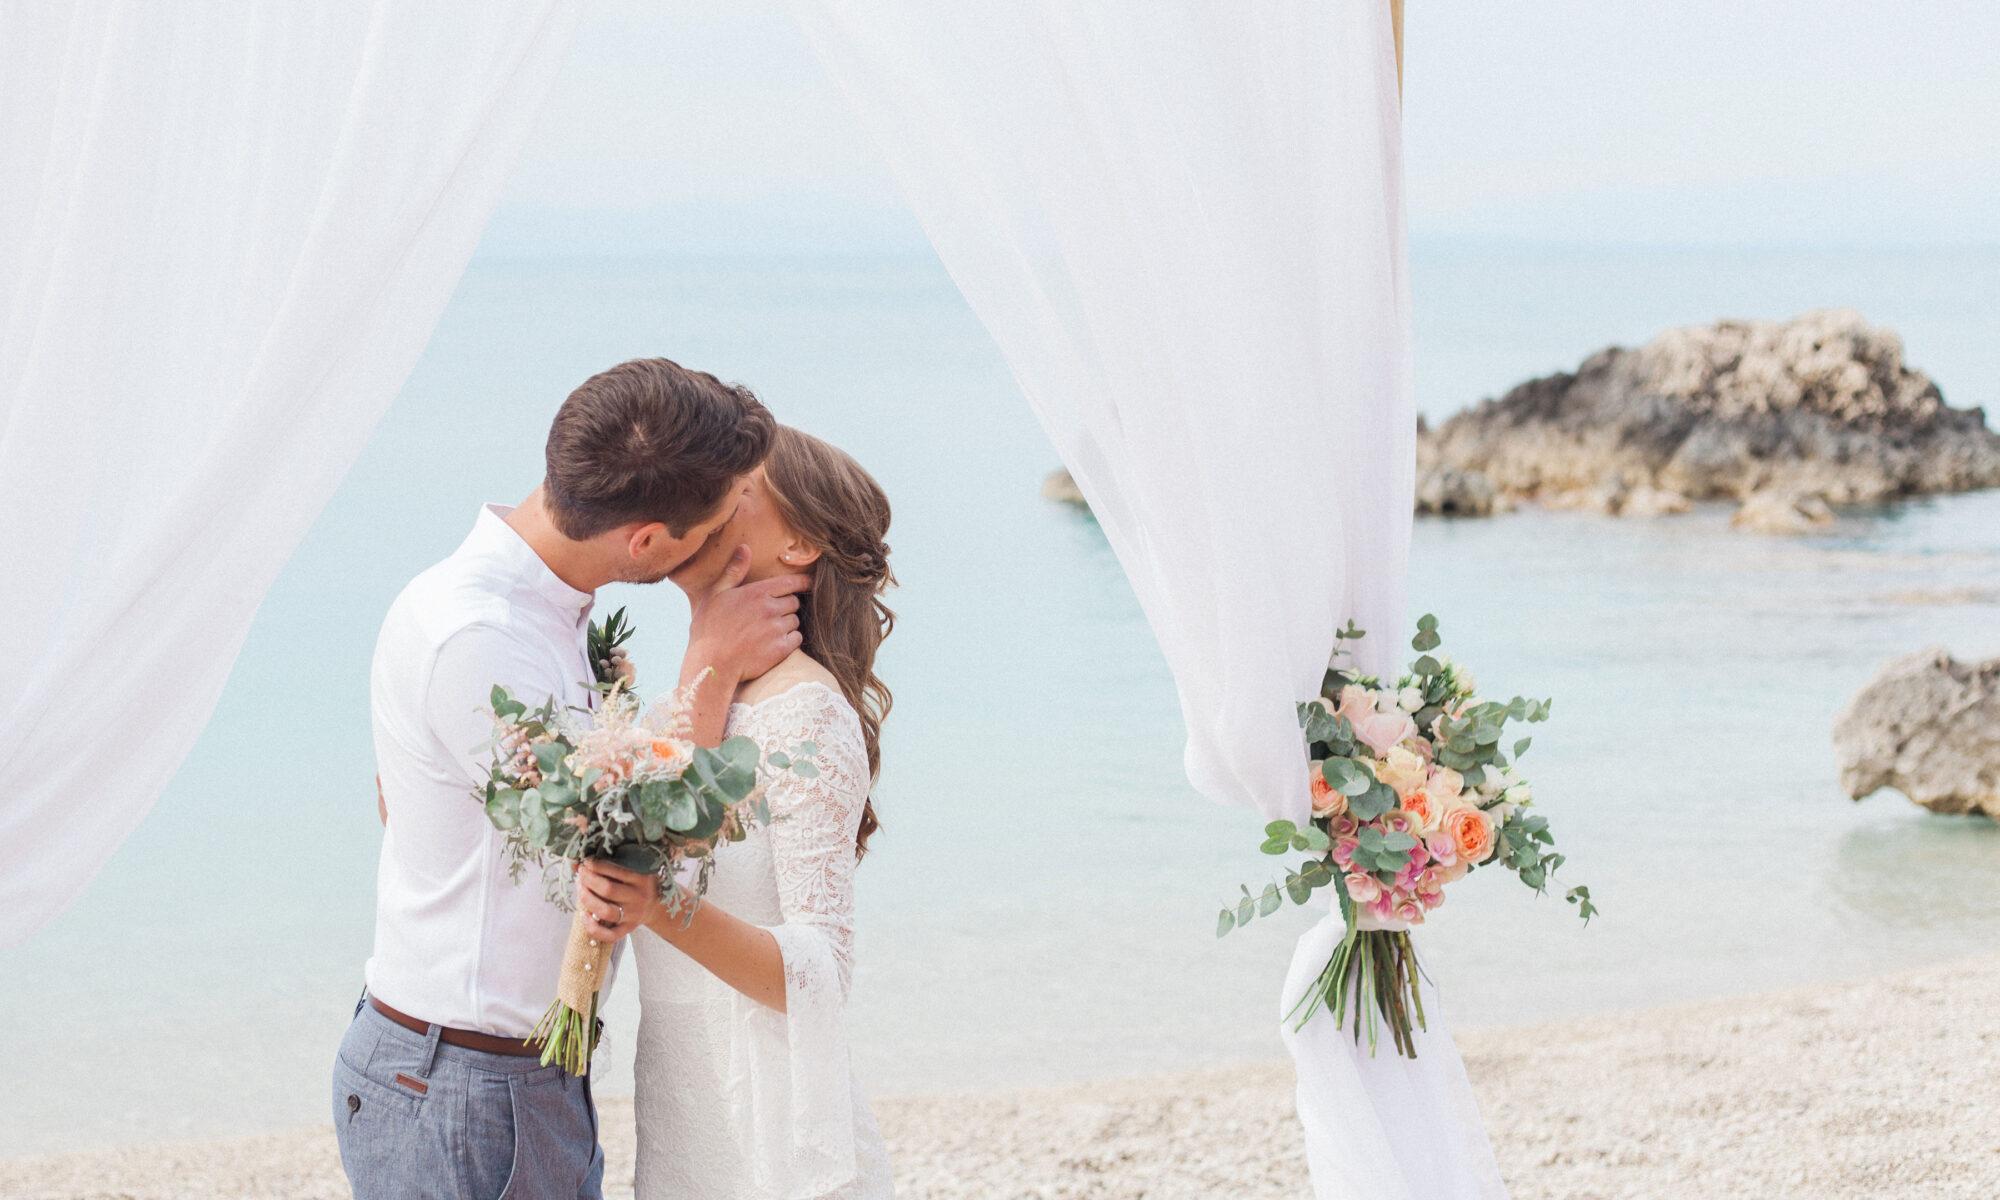 wedding couple kiss under an arch on a beautiful beach in greece